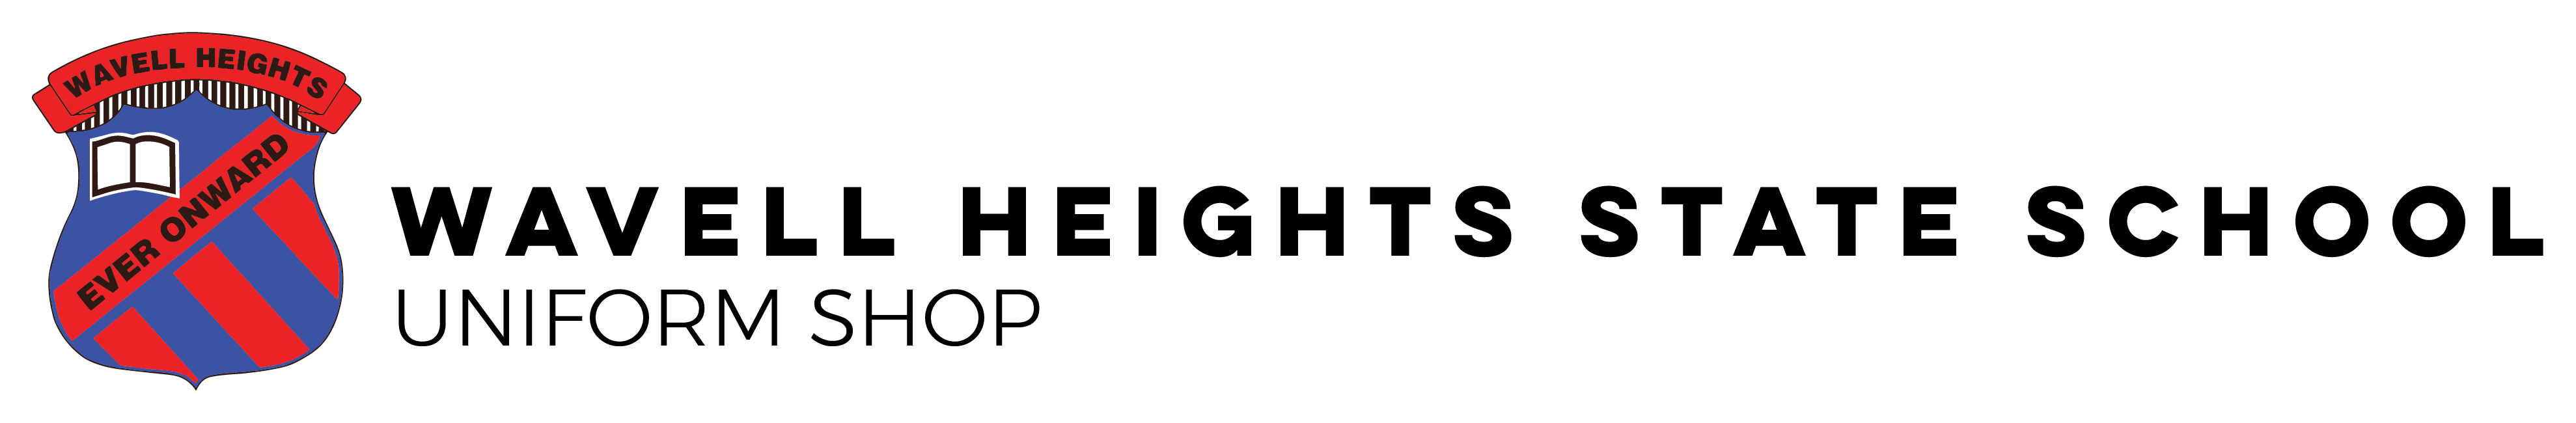 Wavell Heights Logo